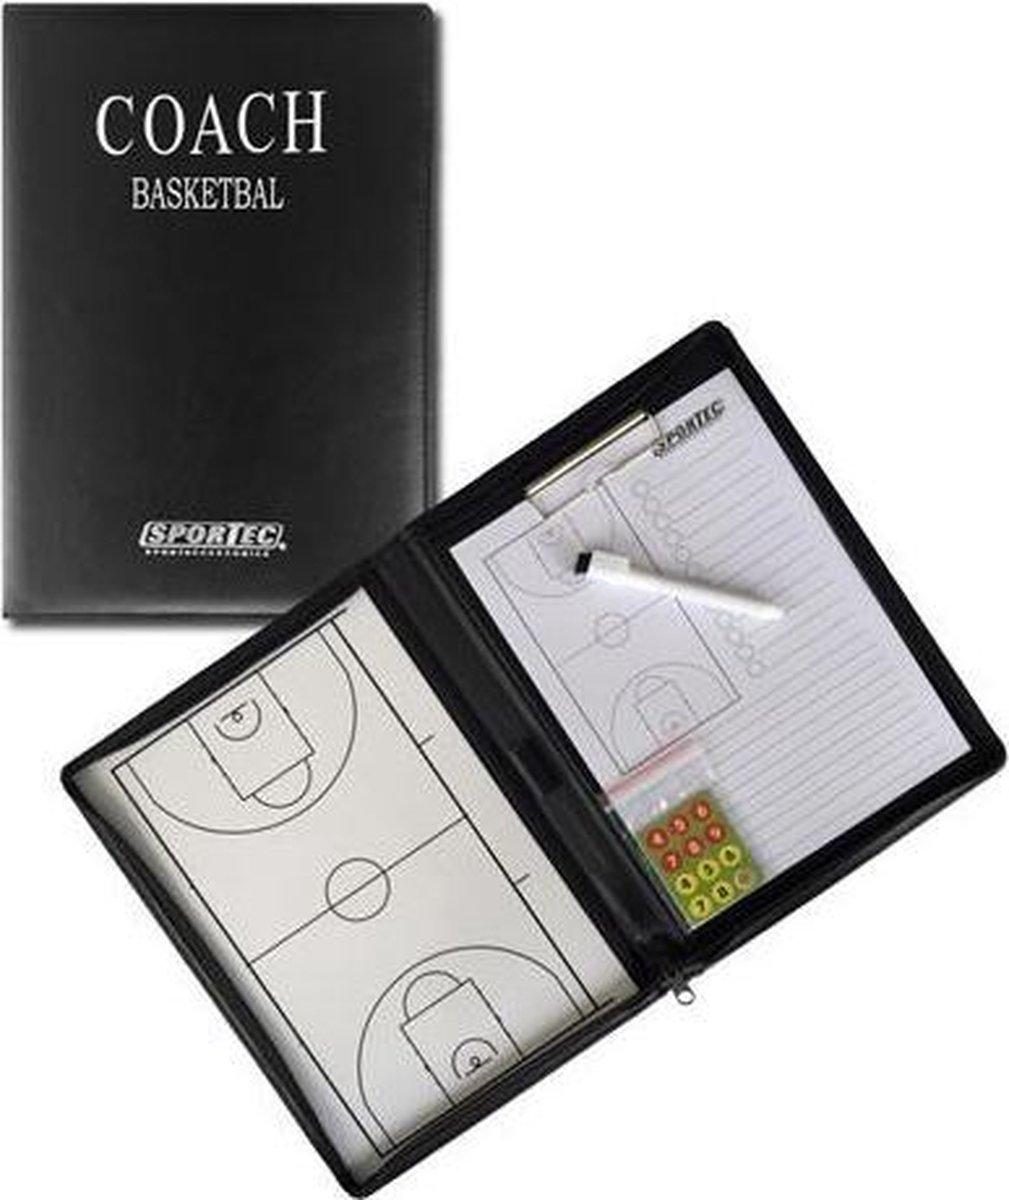 Sportec Coachmap Basketbal Magnetisch 52 X 36 Cm Zwart